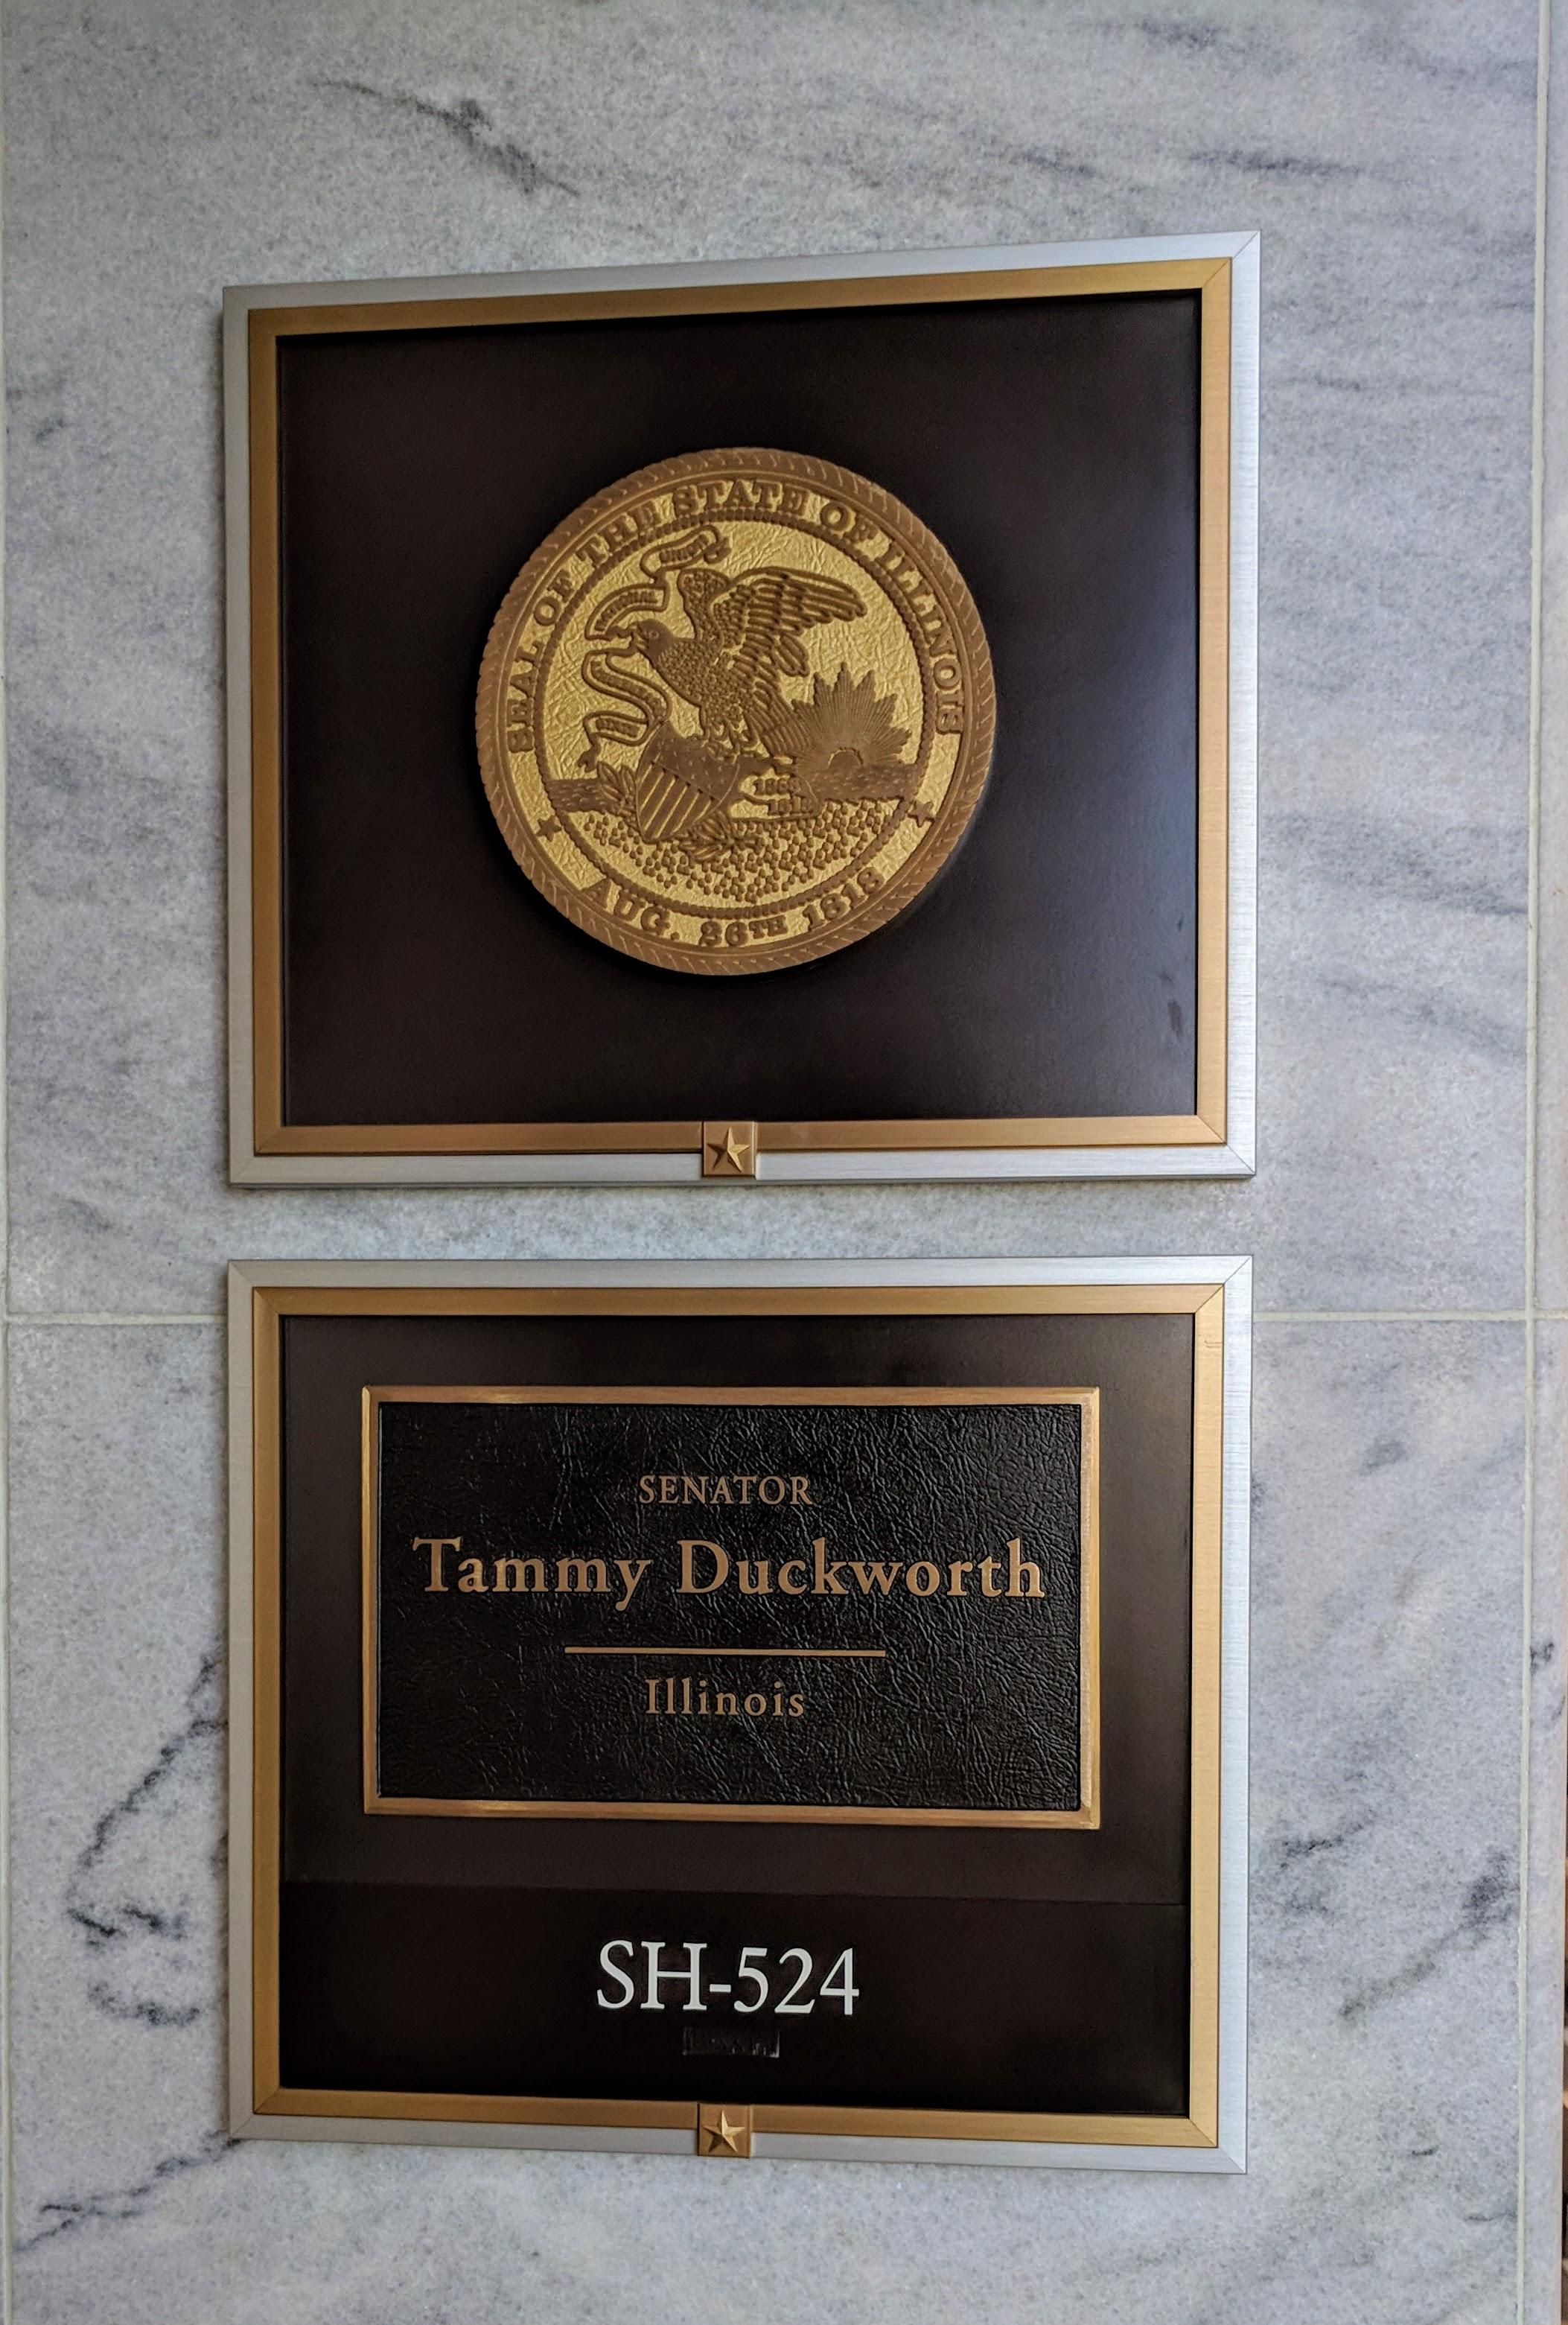 Meeting with Senator Duckworth's staff